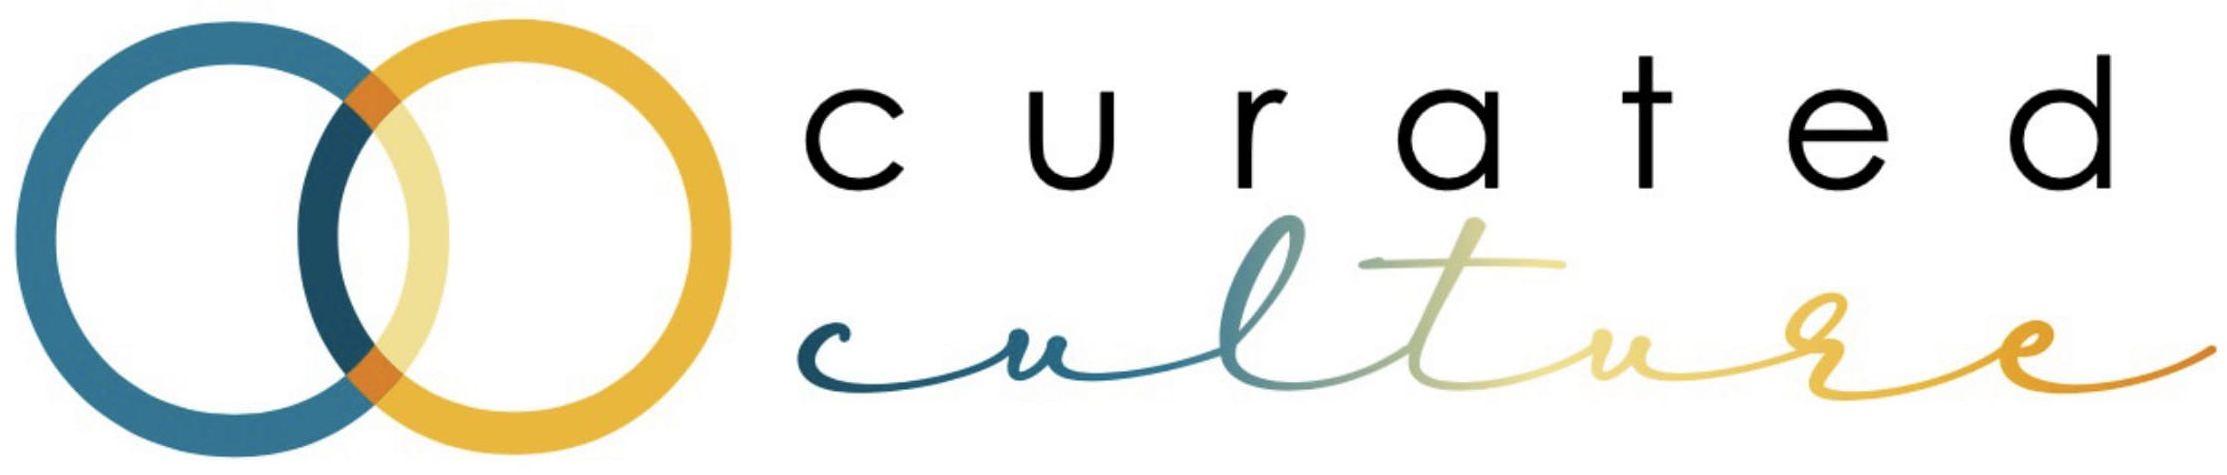 Wort-/Bildmarke: curated culture